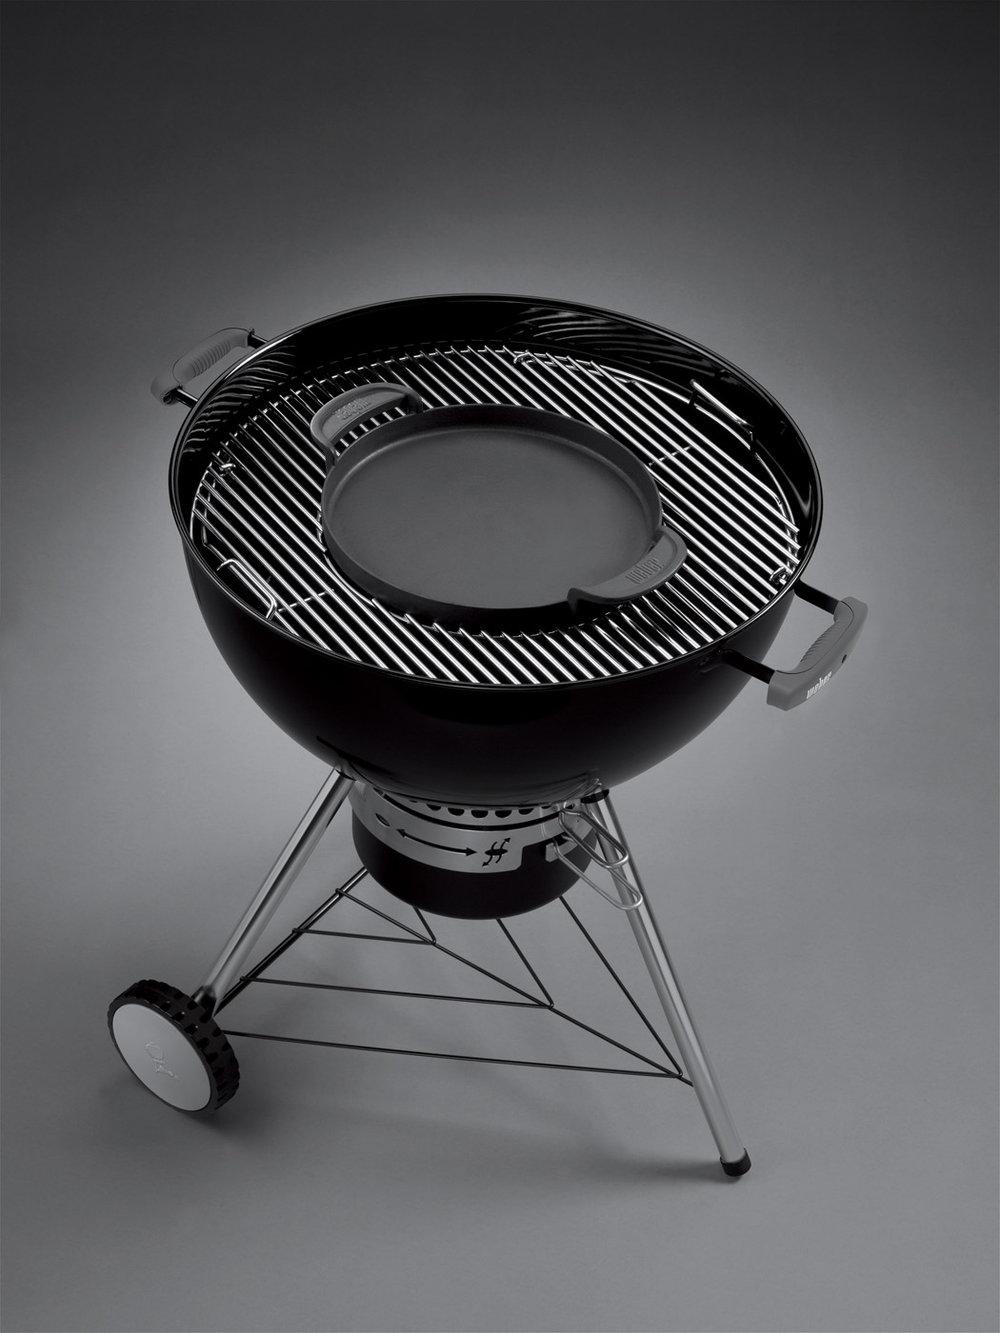 WEBER-PLANCHA-HIERRO-COLADO-BBQ-GOURMET_7421A-2s.jpg